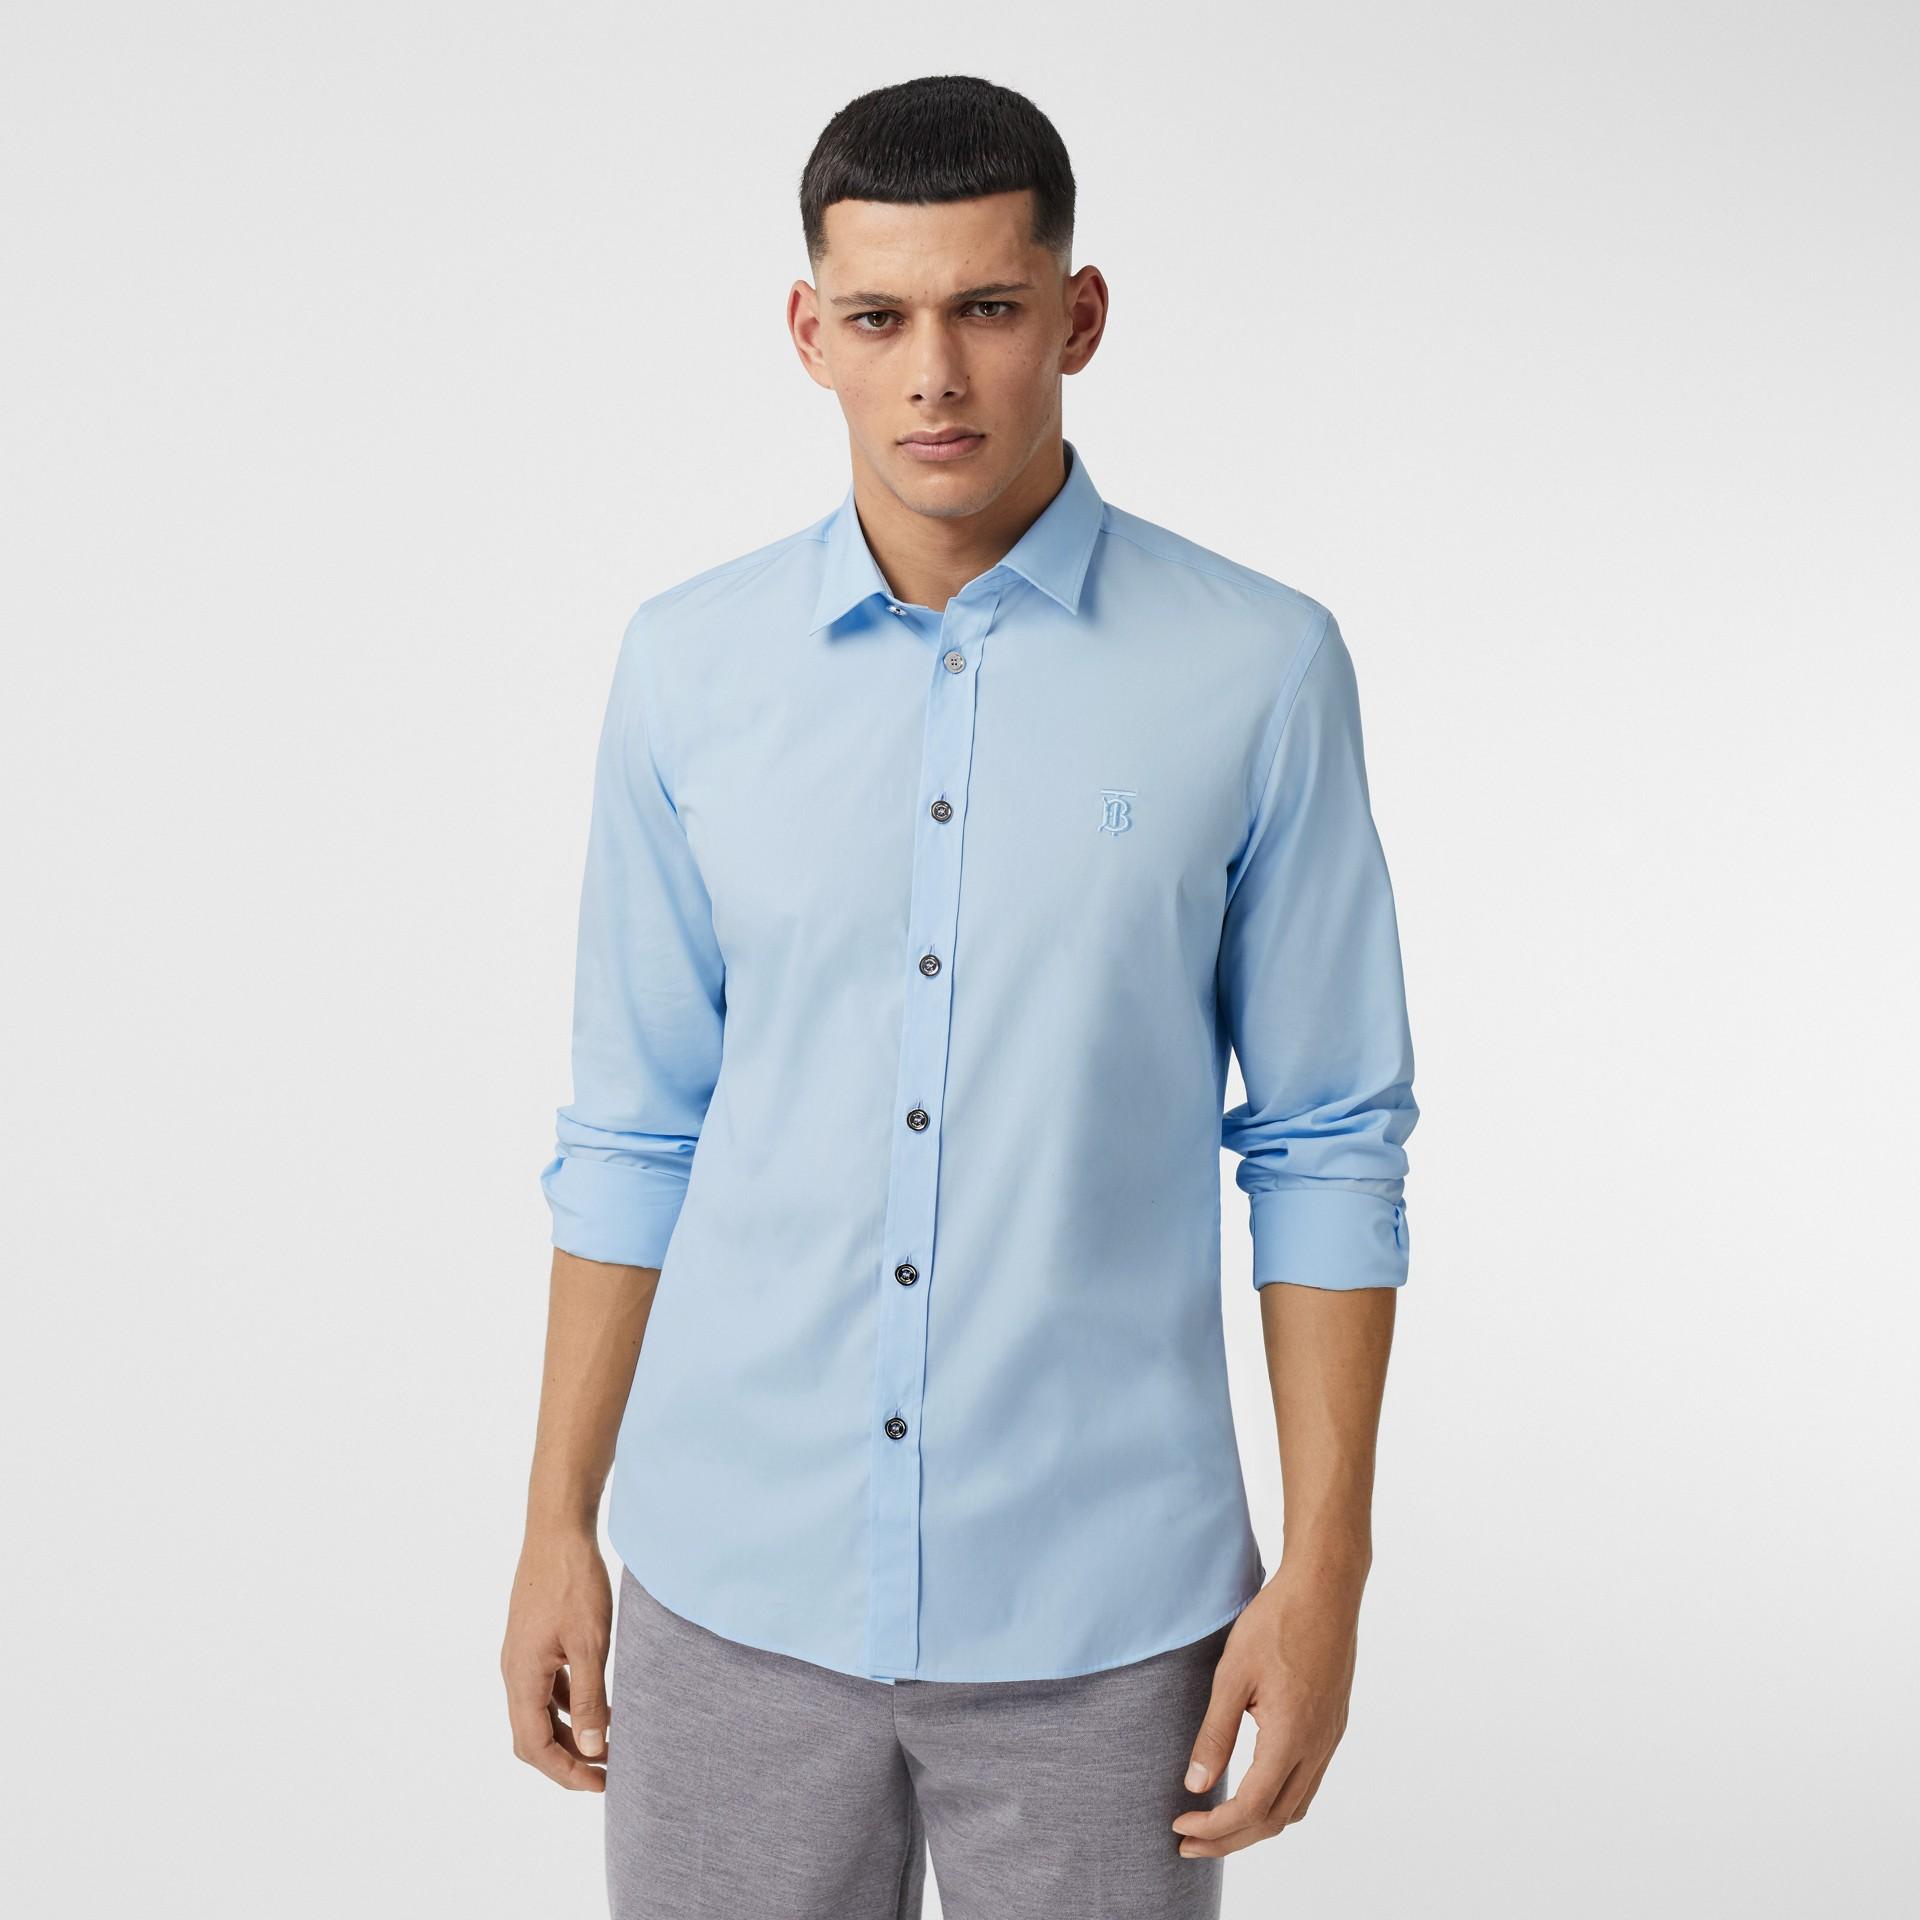 Monogram Motif Stretch Cotton Poplin Shirt in Pale Blue - Men   Burberry Australia - gallery image 0